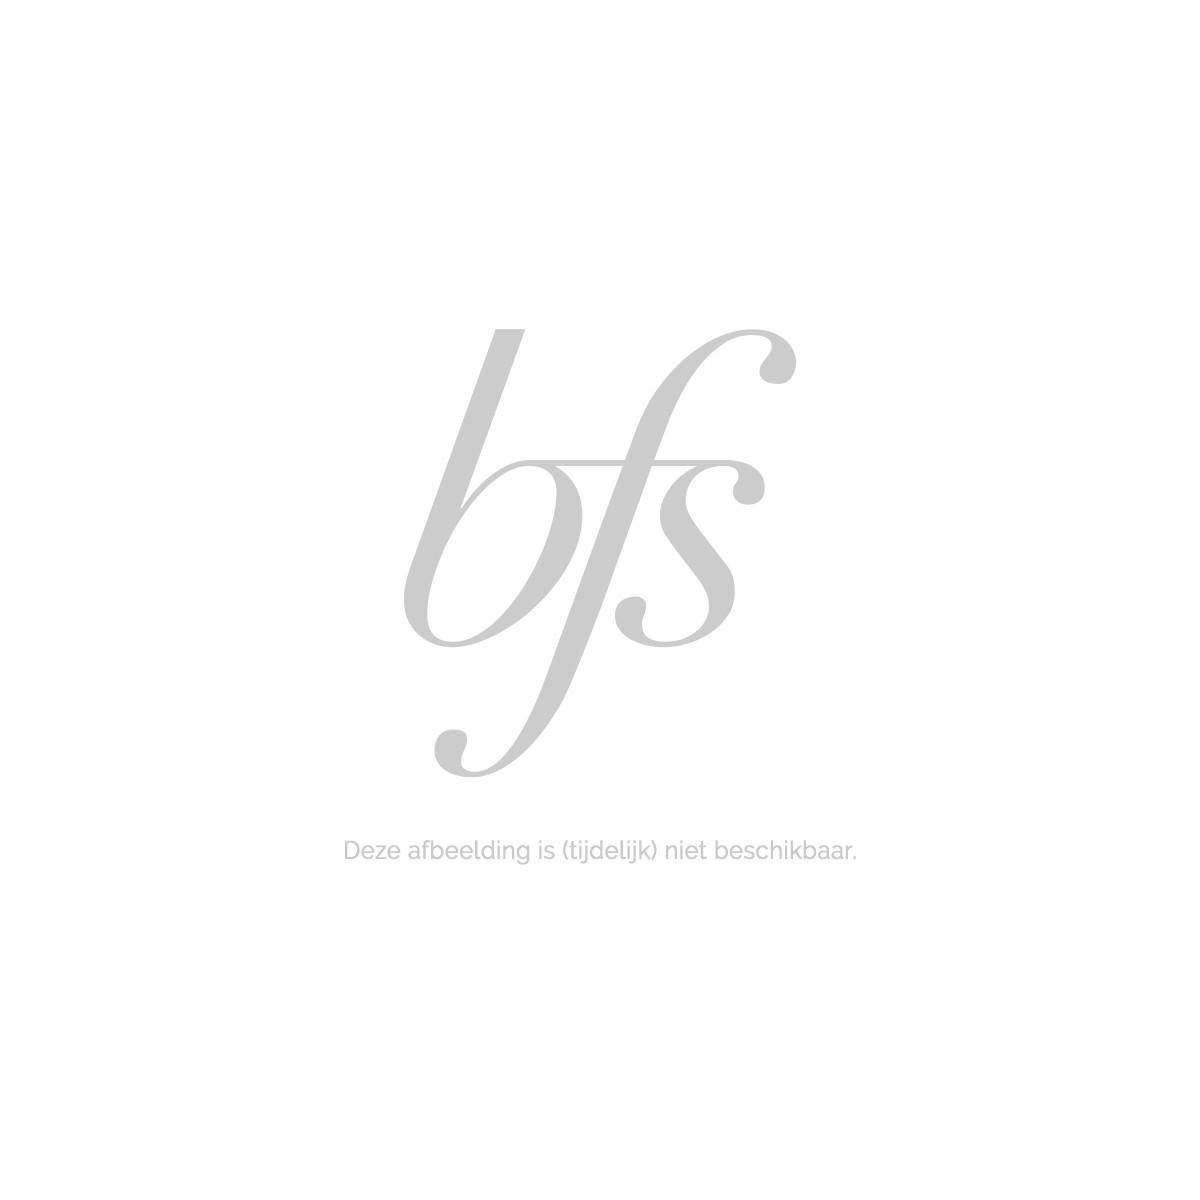 Christian Dior Diorshow Black Out Waterproof Mascara 10 Ml